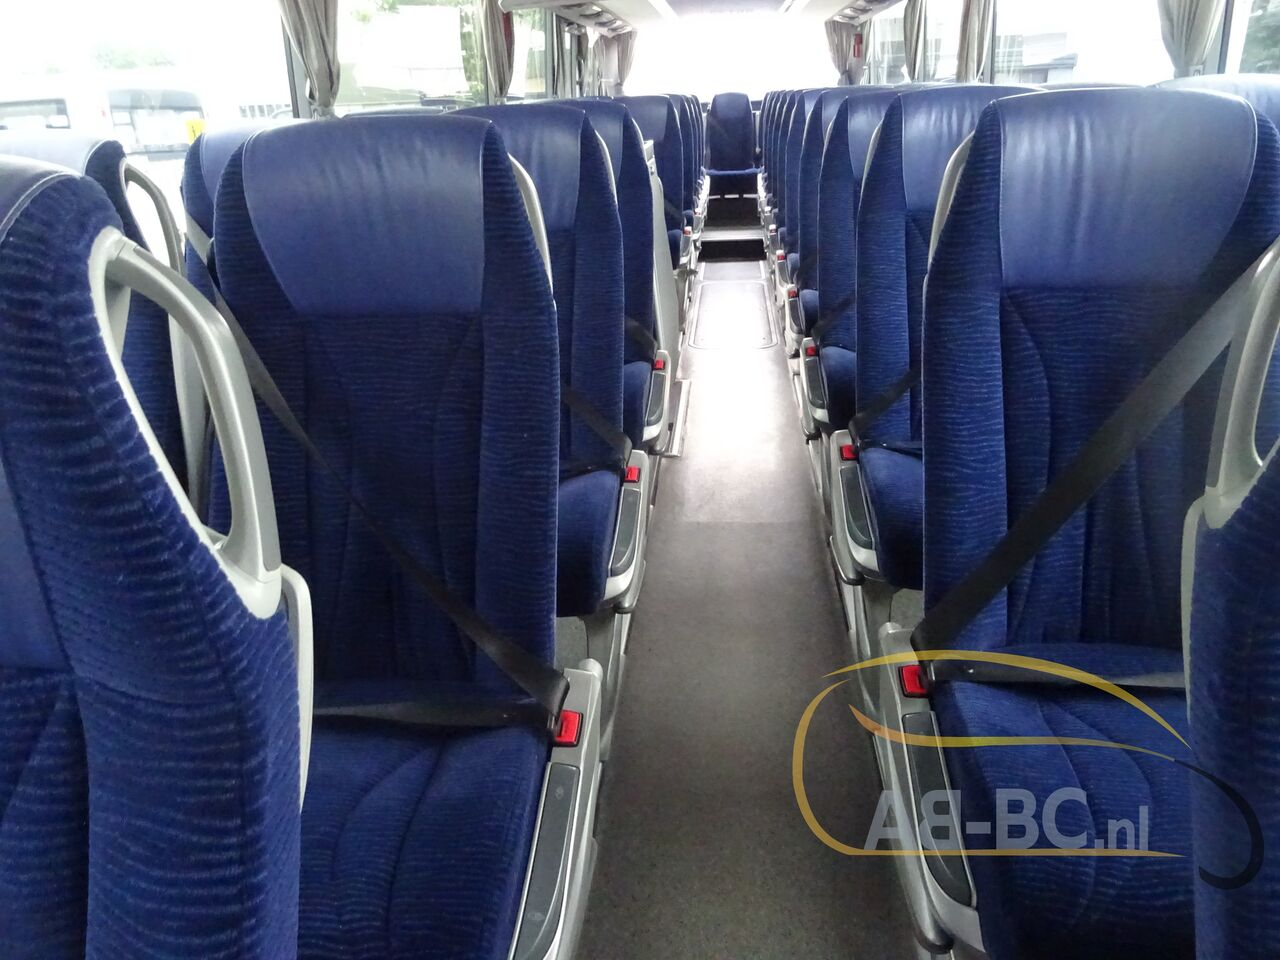 coach-busSETRA-S415-GT-HD-FINAL-EDITION---1627457223807151738_big_3858344b8c8a3928a63558cb17806d3f--21050713010665719300